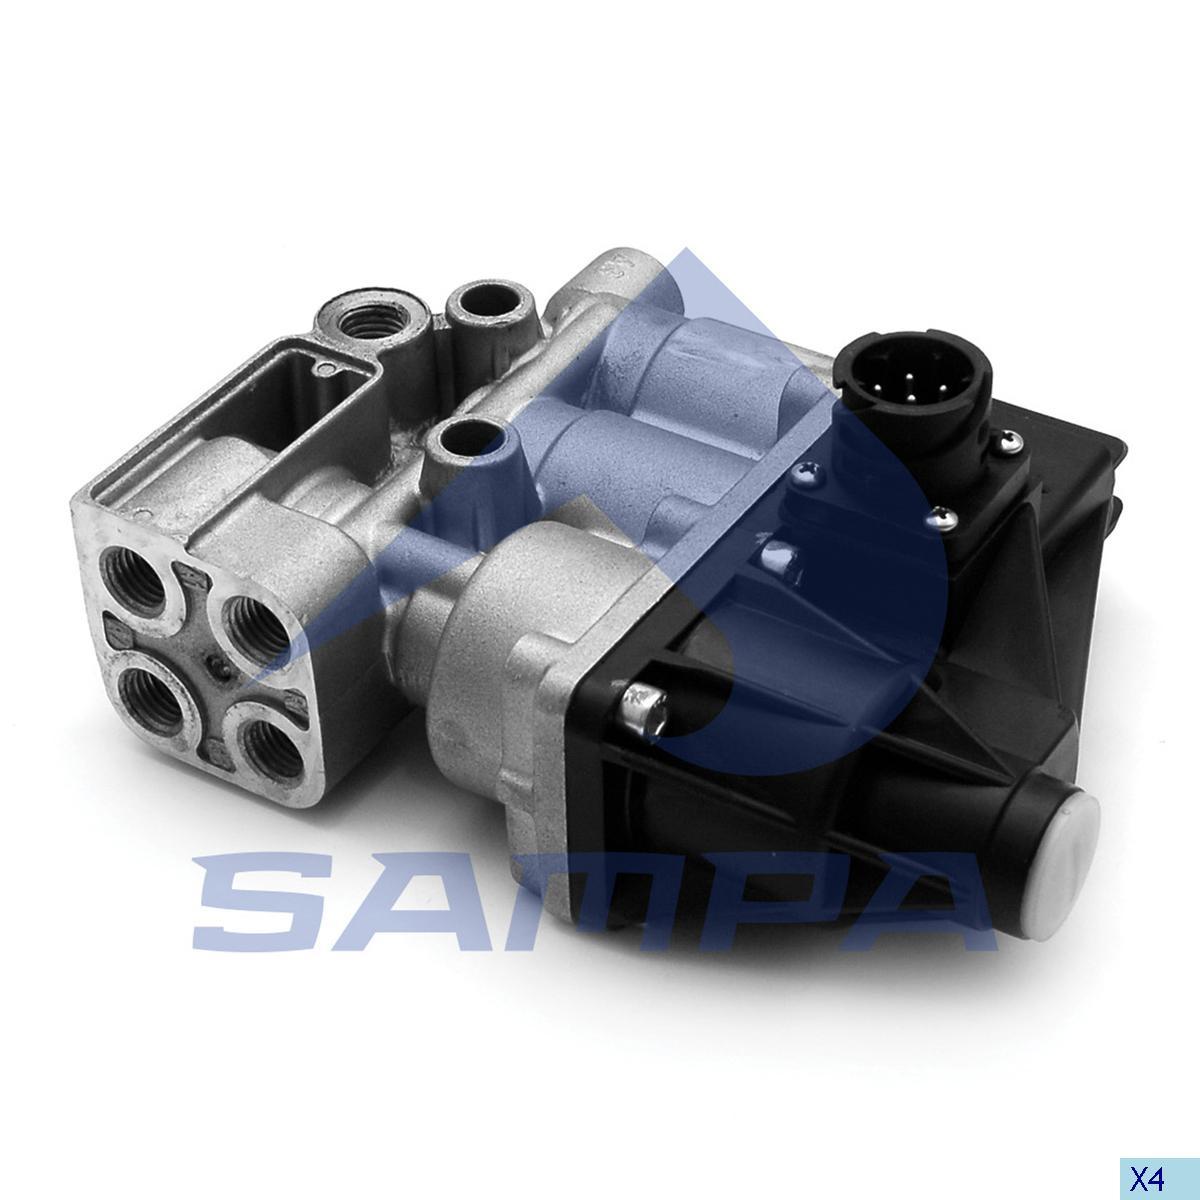 Solenoid Valve, Scania, Compressed Air System